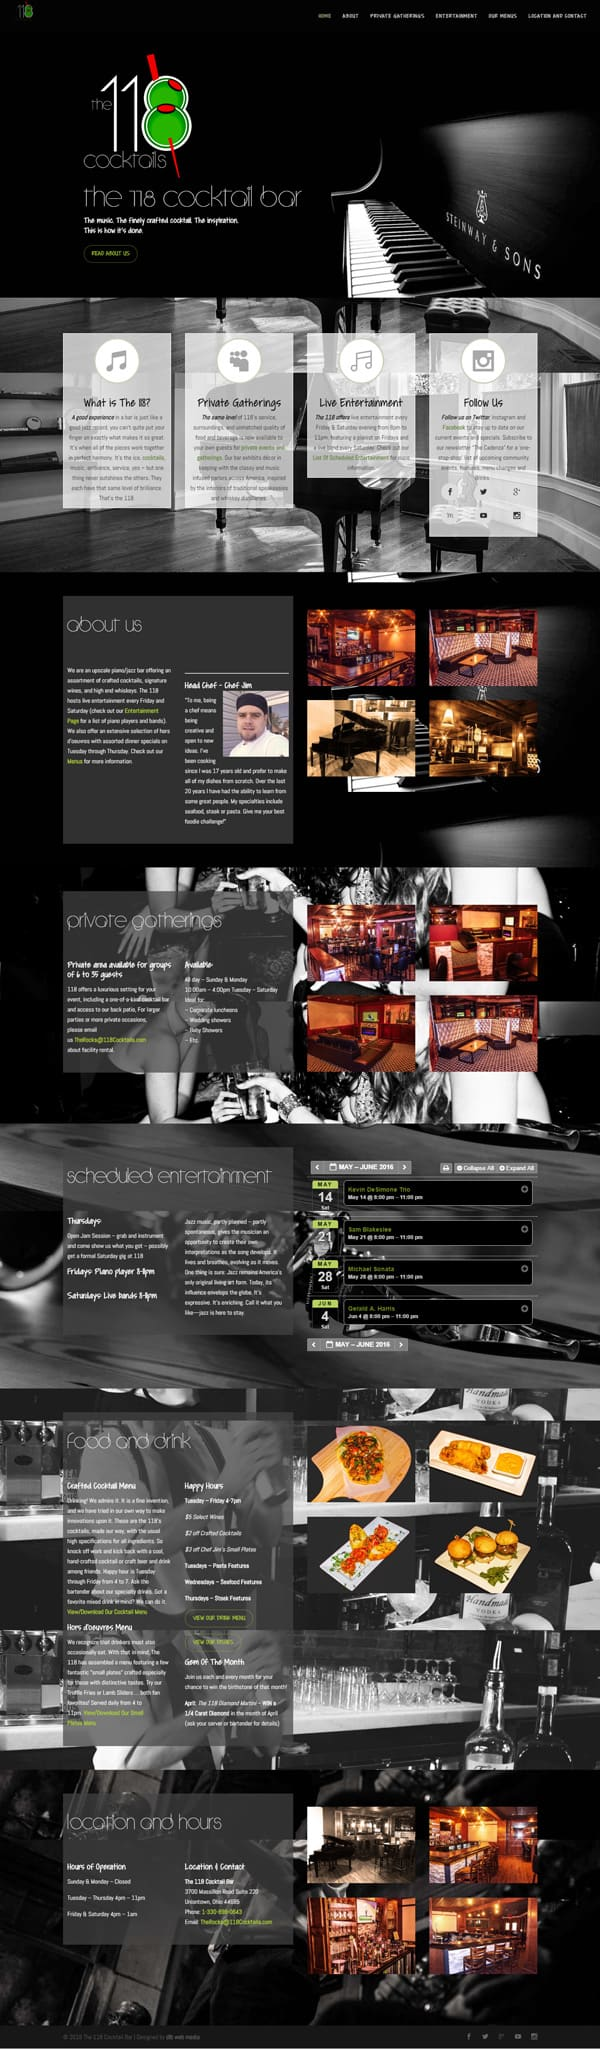 one page web design 118 cocktails.com